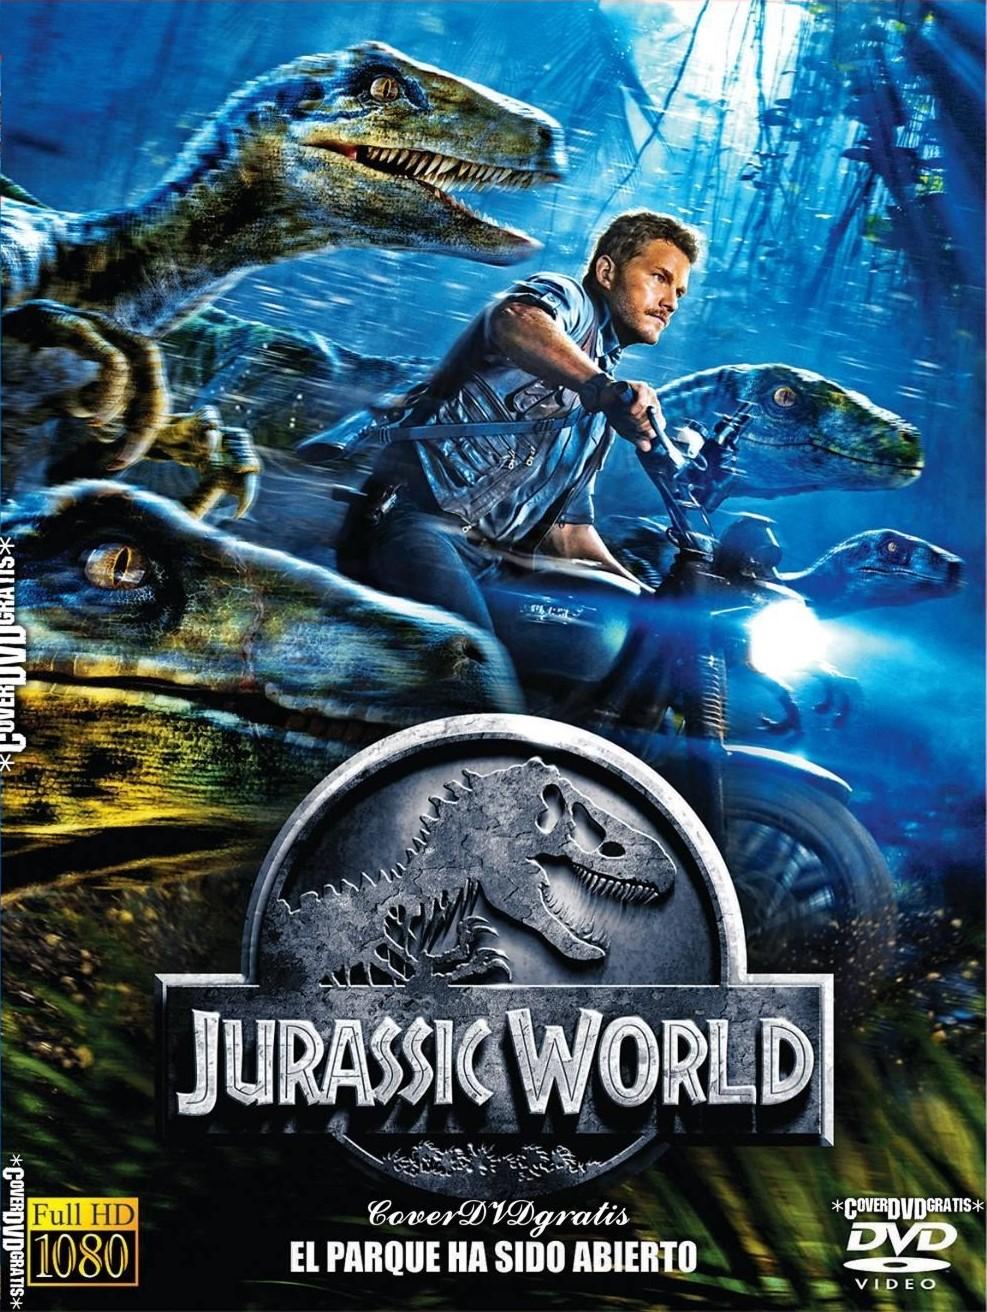 Jurassic World (2015) HDTS